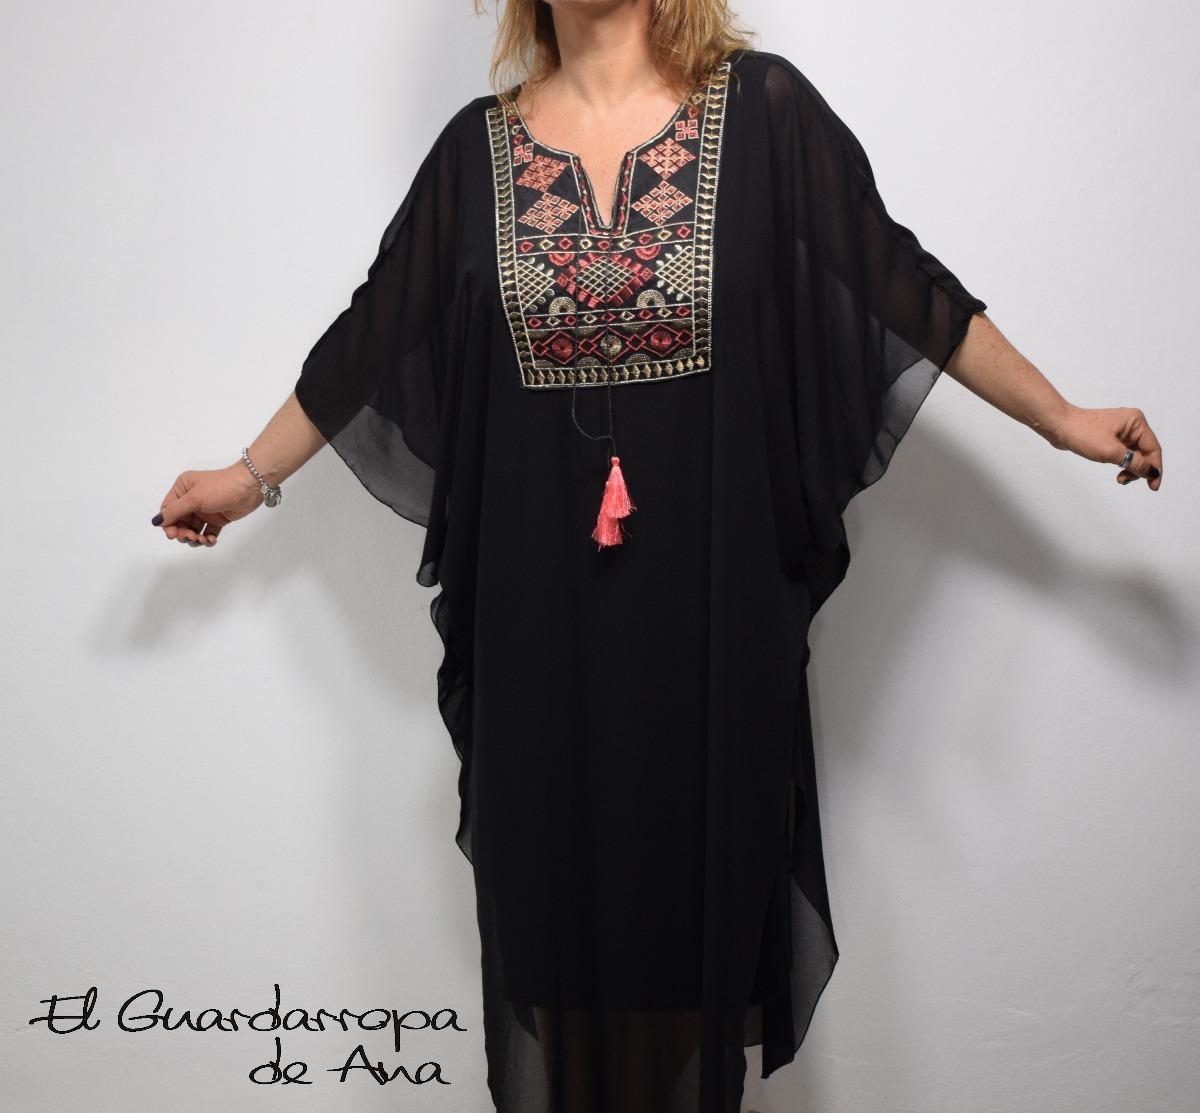 417b681e6 túnica vestido largo gasa bordado manga mariposa boho chic. Cargando zoom.